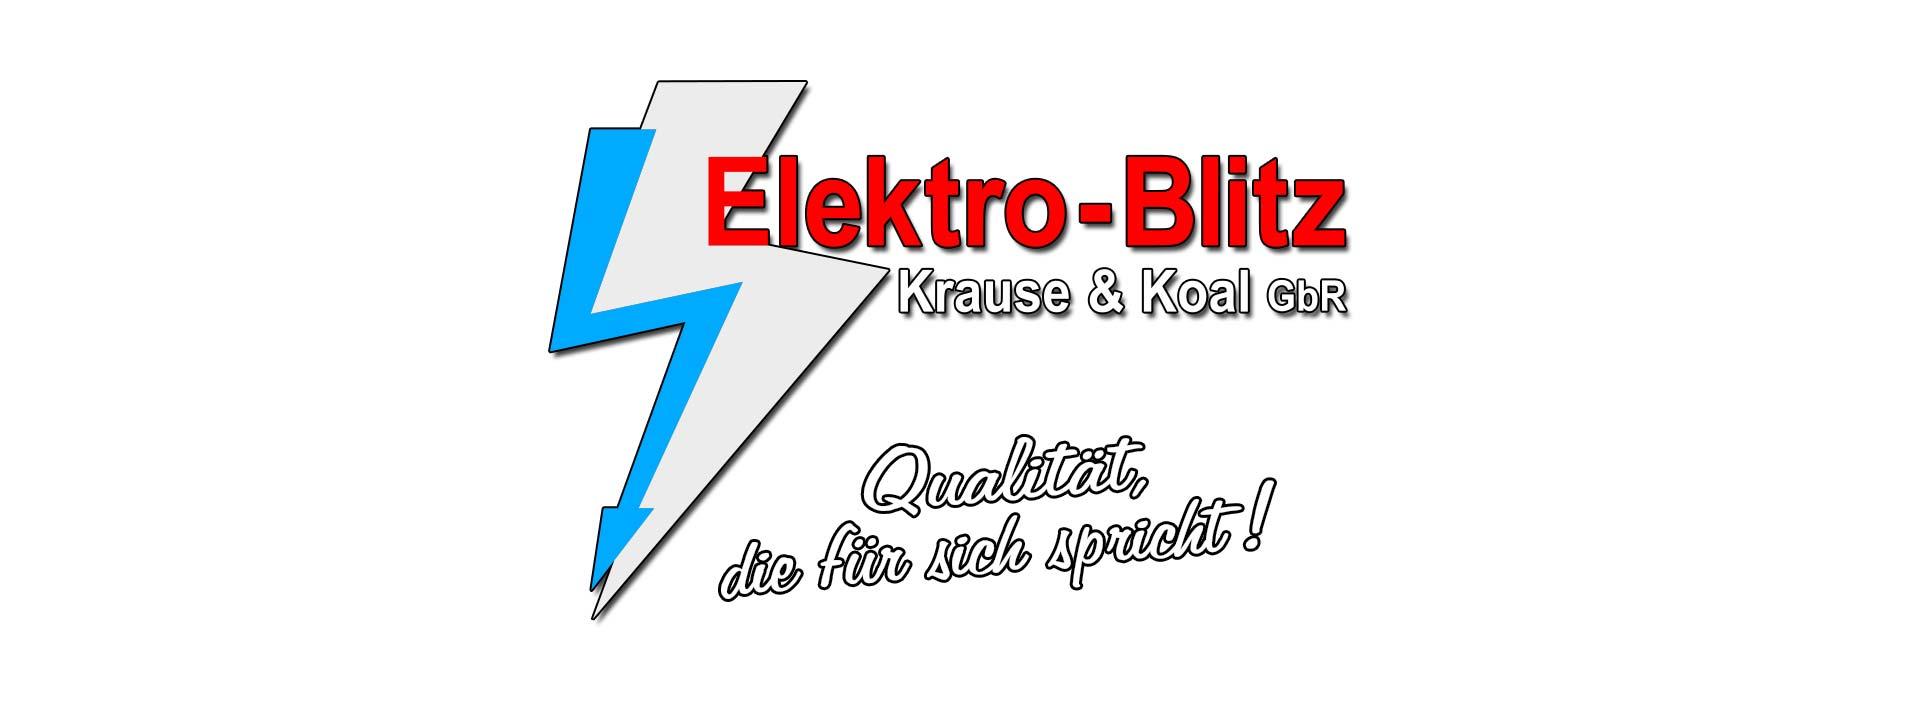 Elektro-Blitz